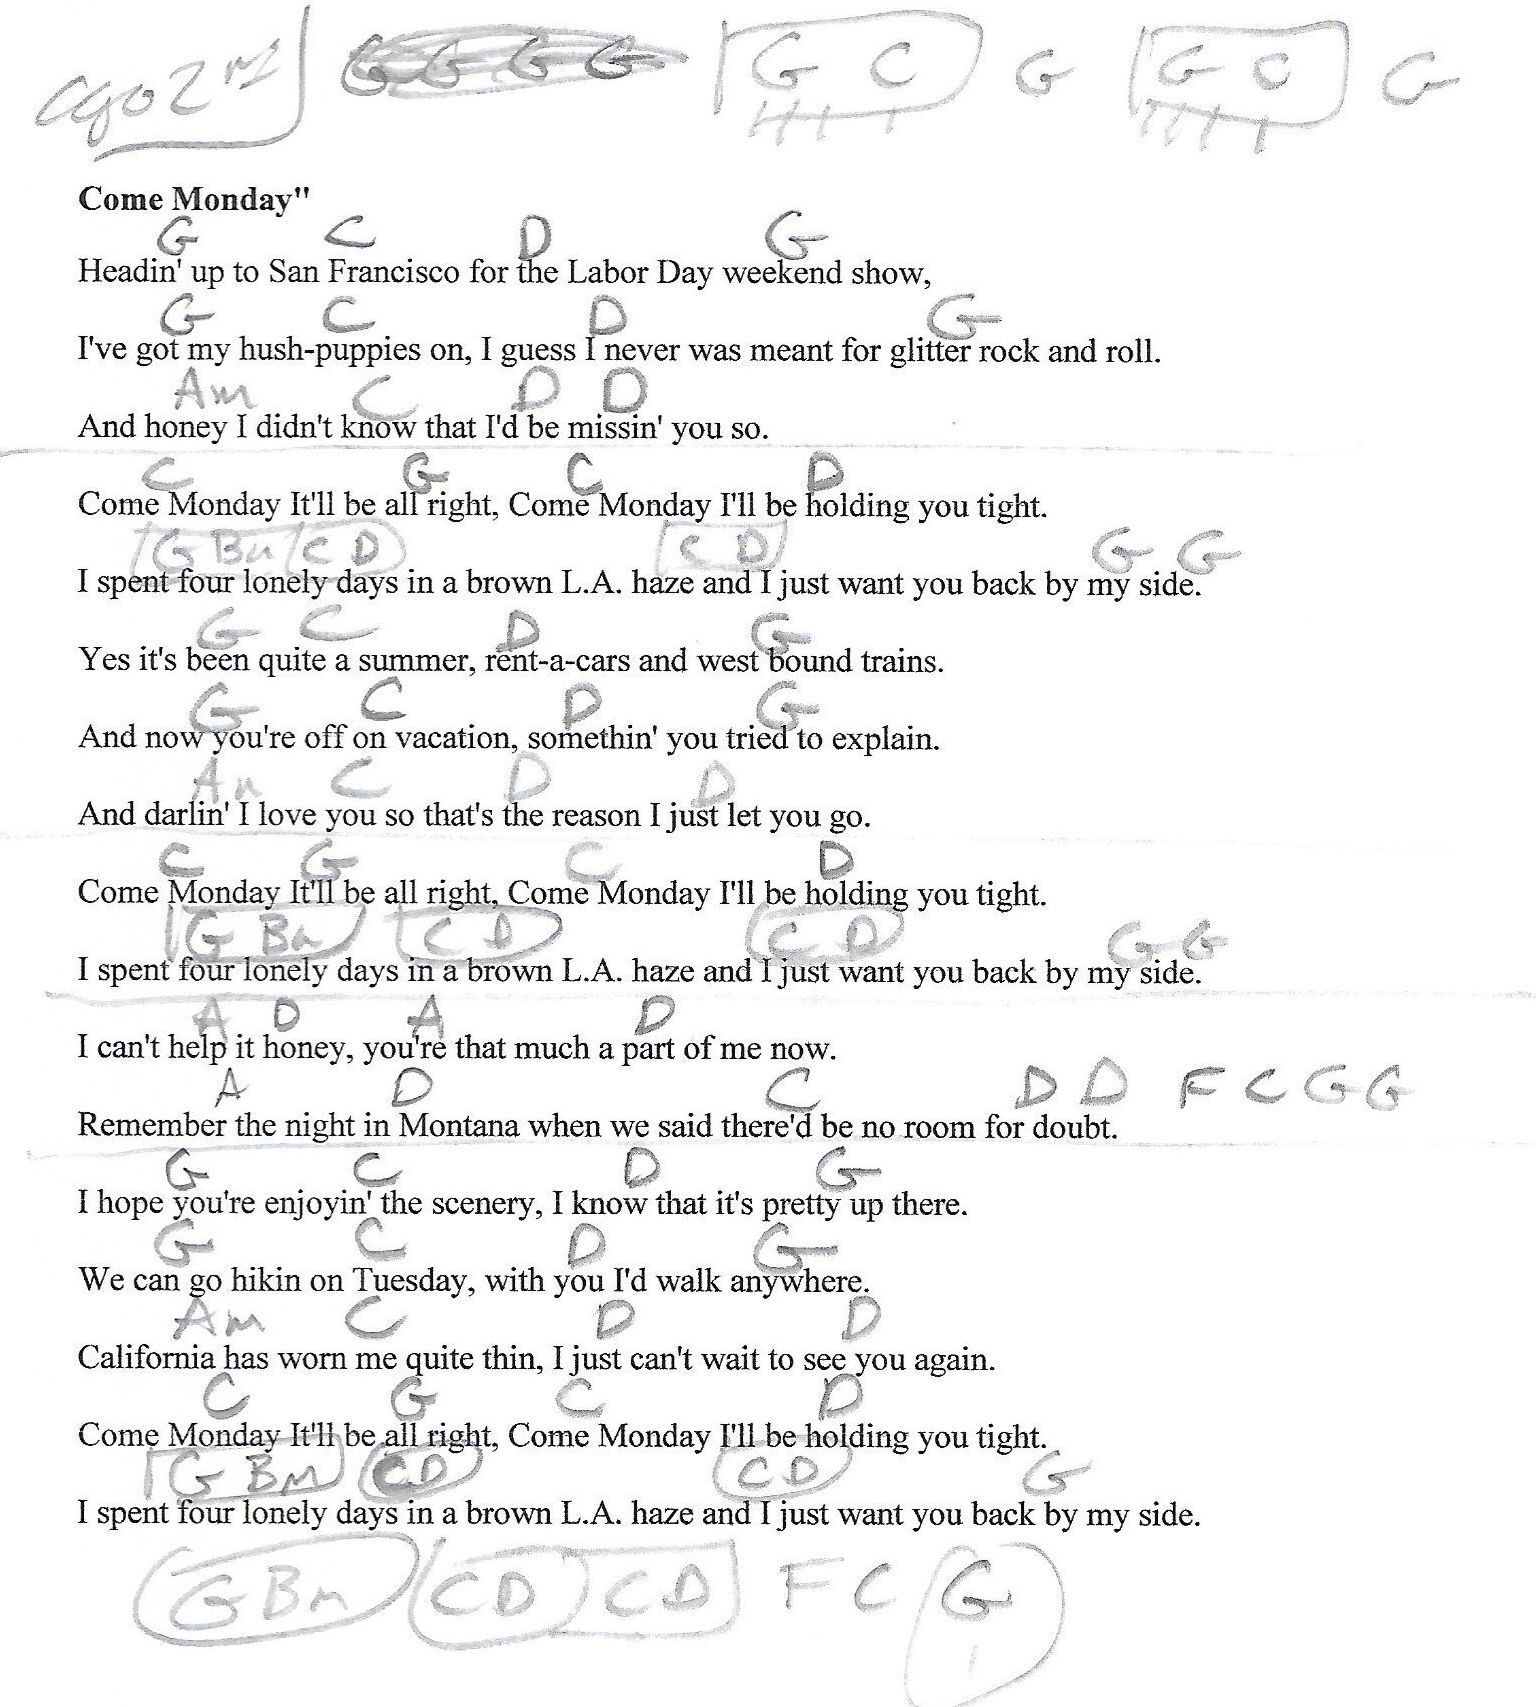 Mariachi guitar chords images guitar chords examples desperado guitar chords image collections guitar chords examples come monday jimmy buffett guitar chord chart capo hexwebz Choice Image